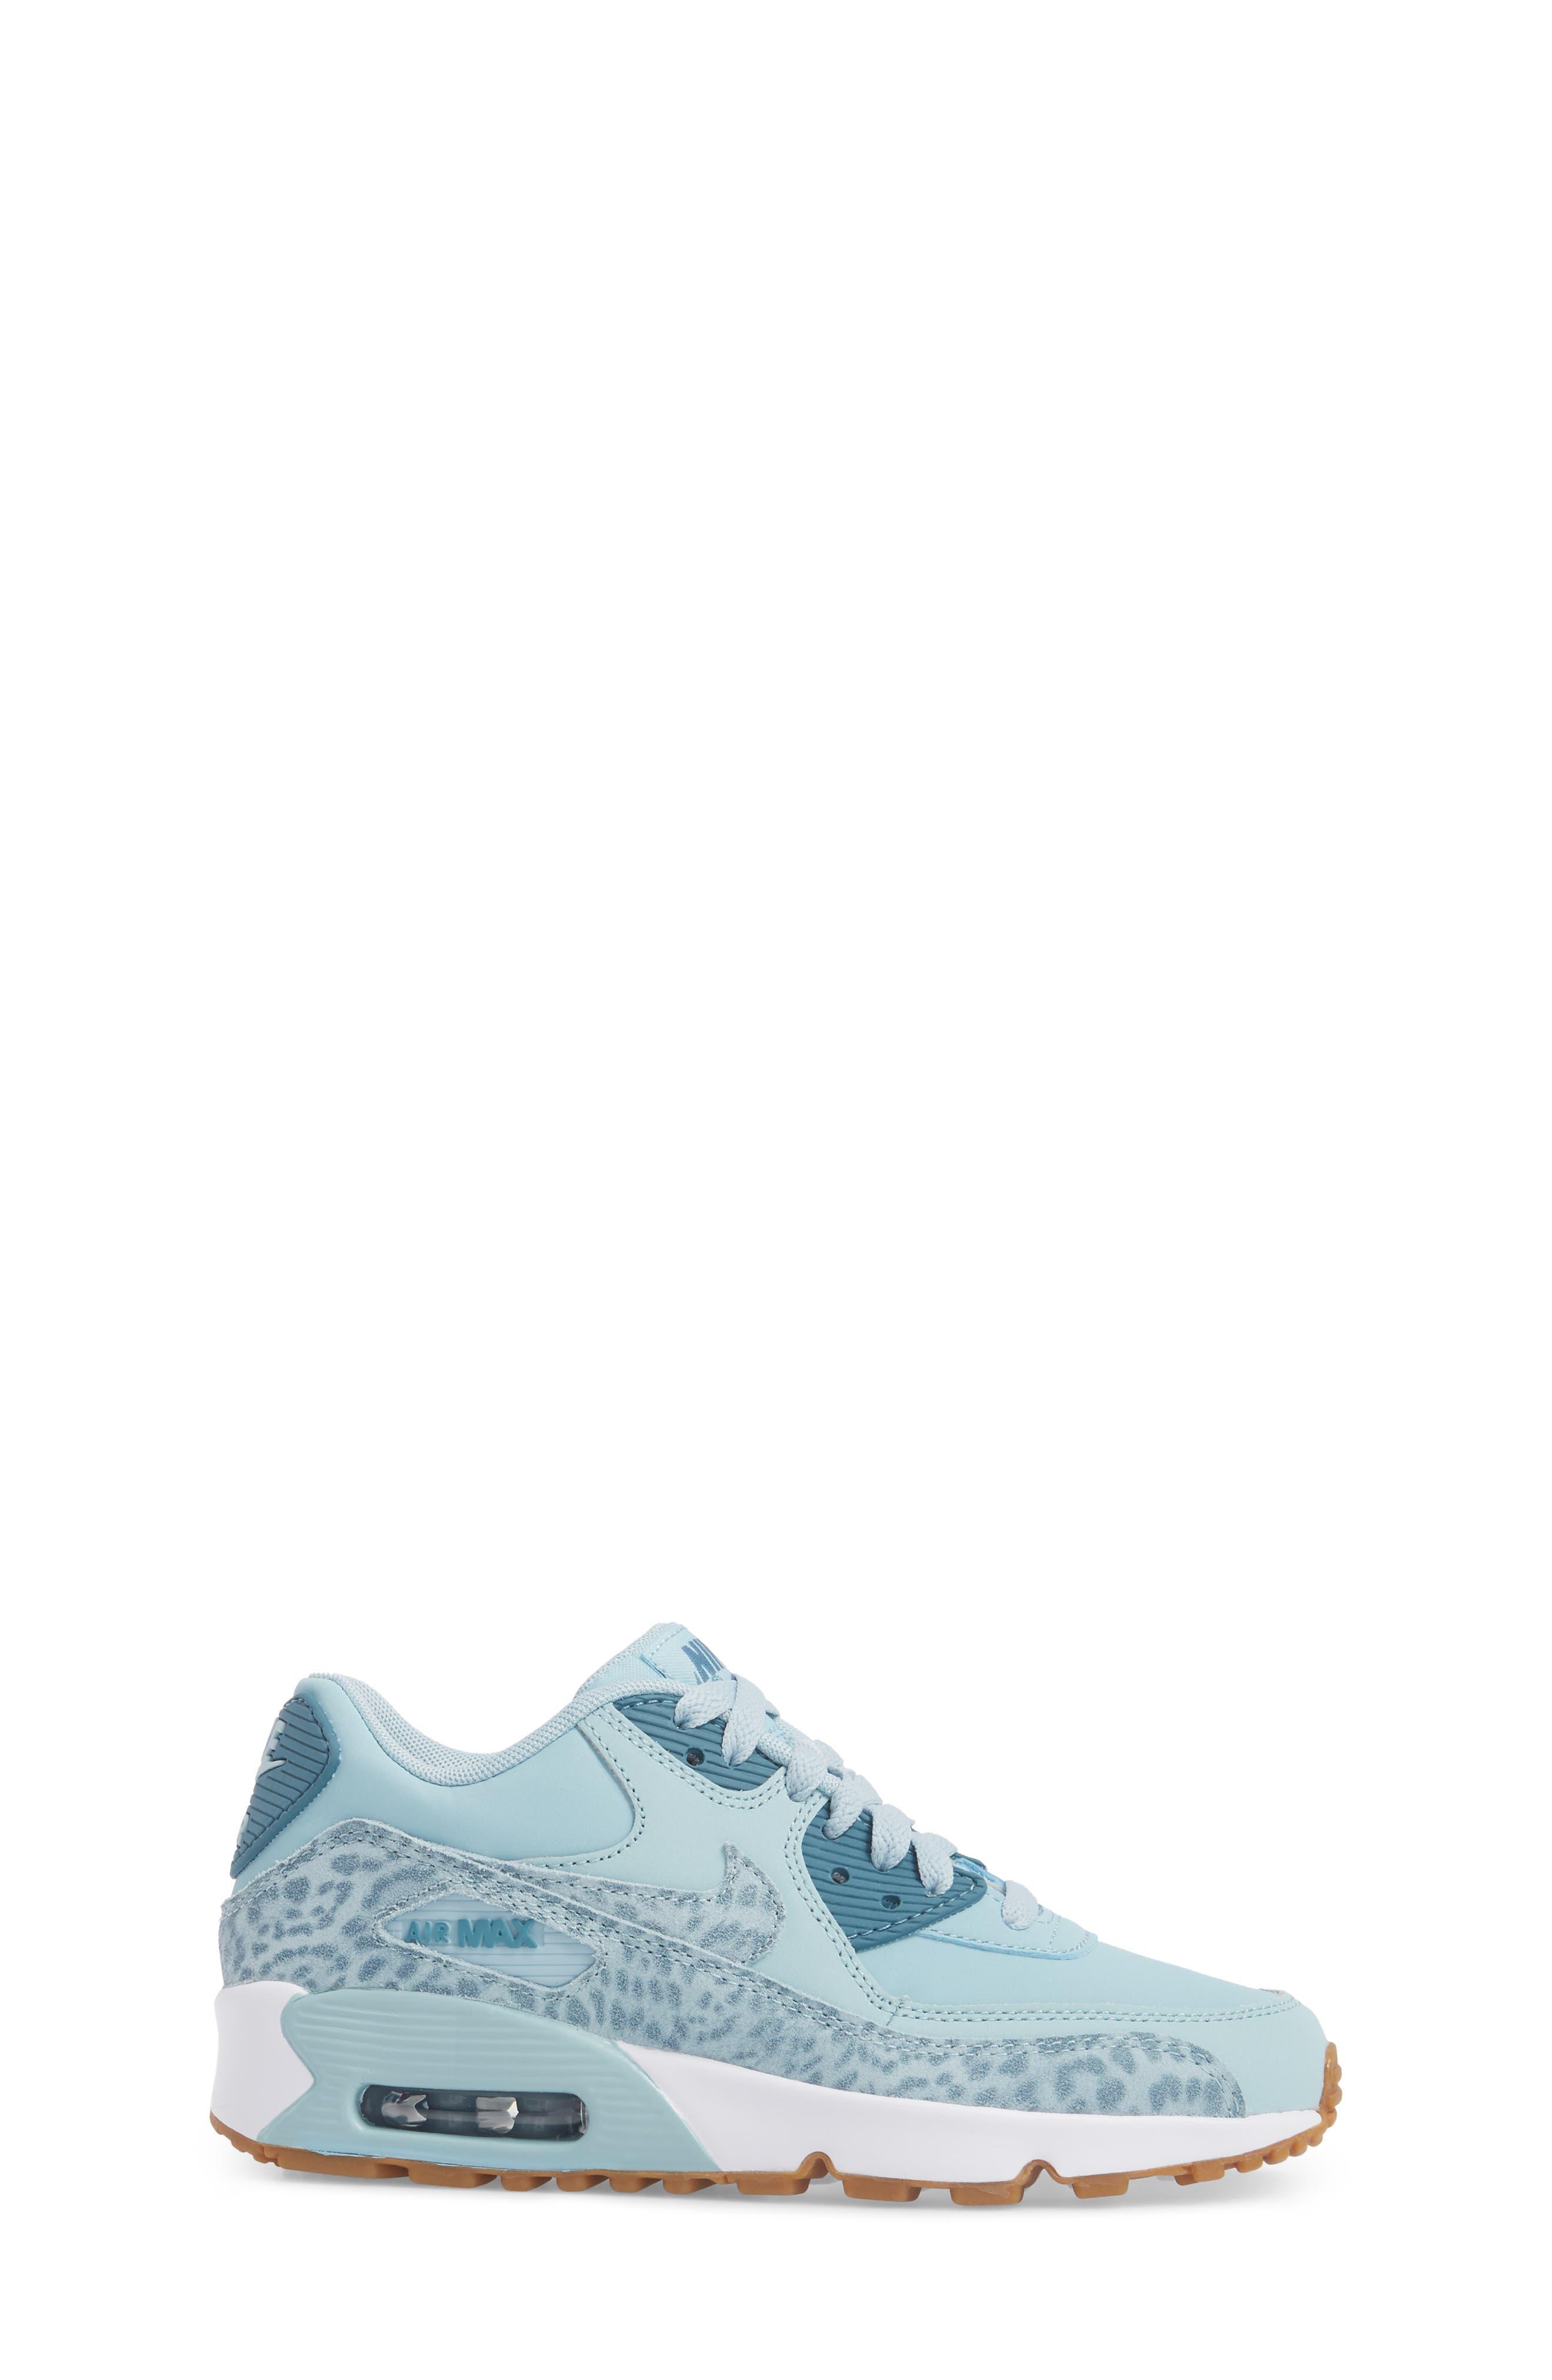 Air Max 90 Leather Sneaker,                             Alternate thumbnail 3, color,                             Ocean Bliss/ Noise Aqua/ White